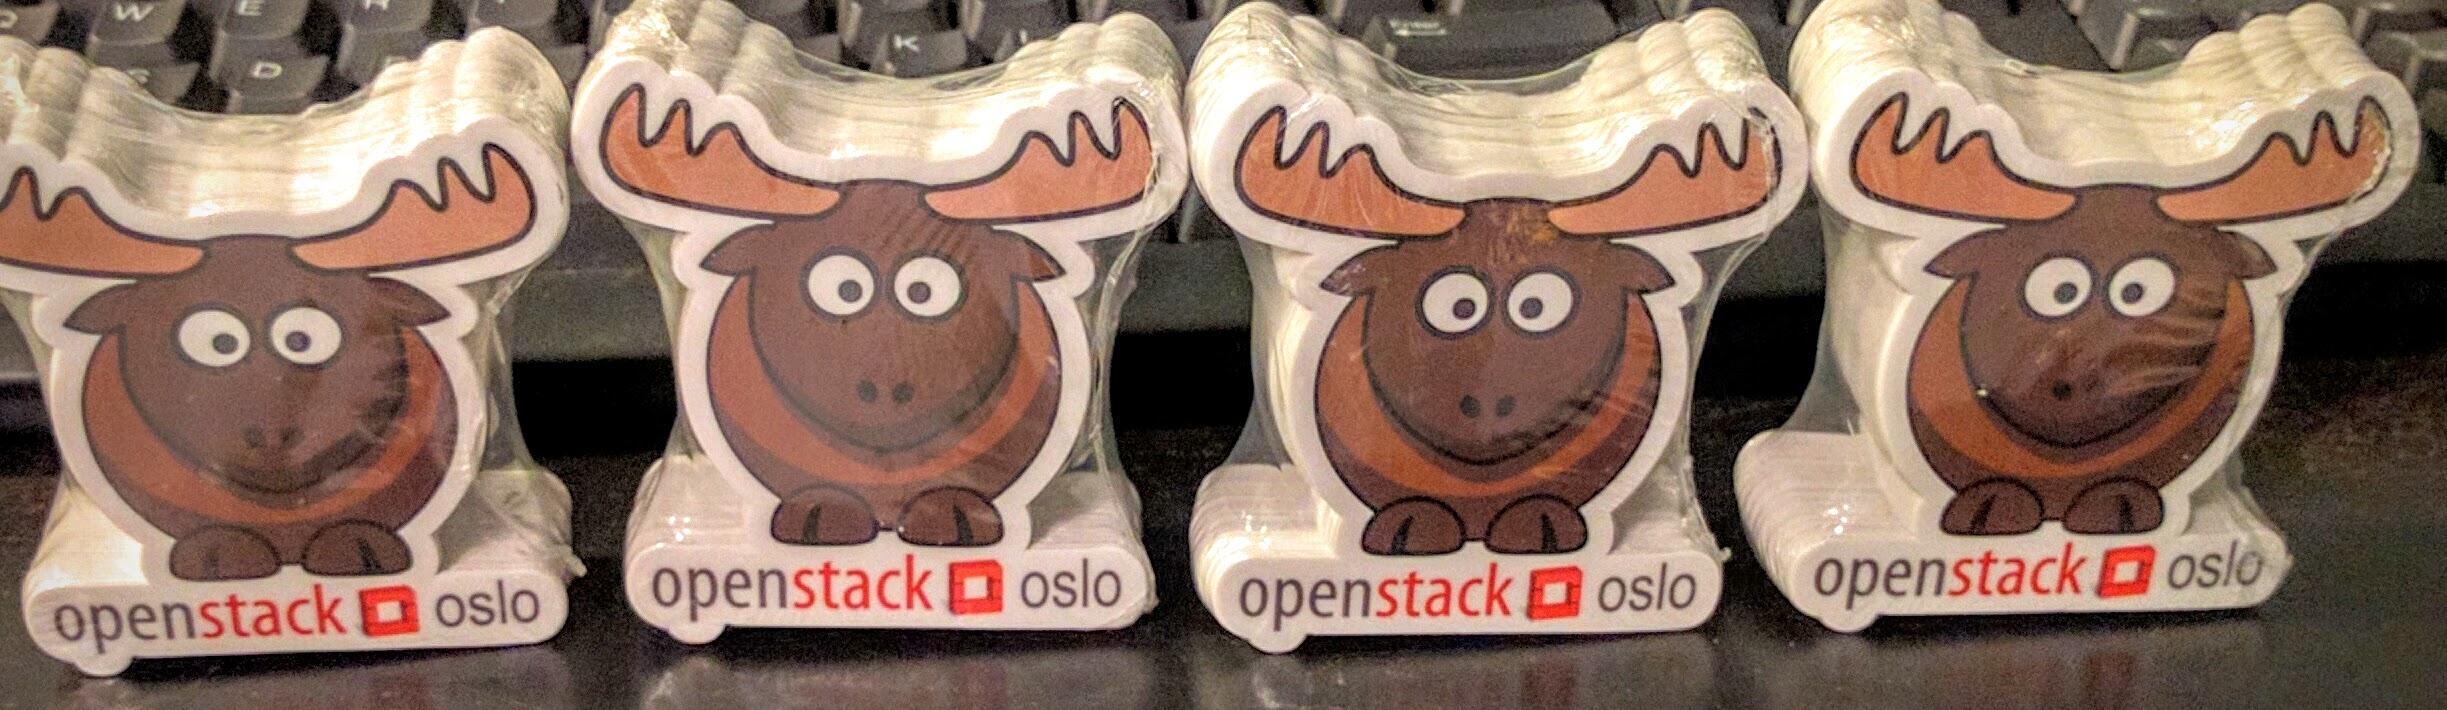 OpenStack Oslo Stickers - Austin 2014